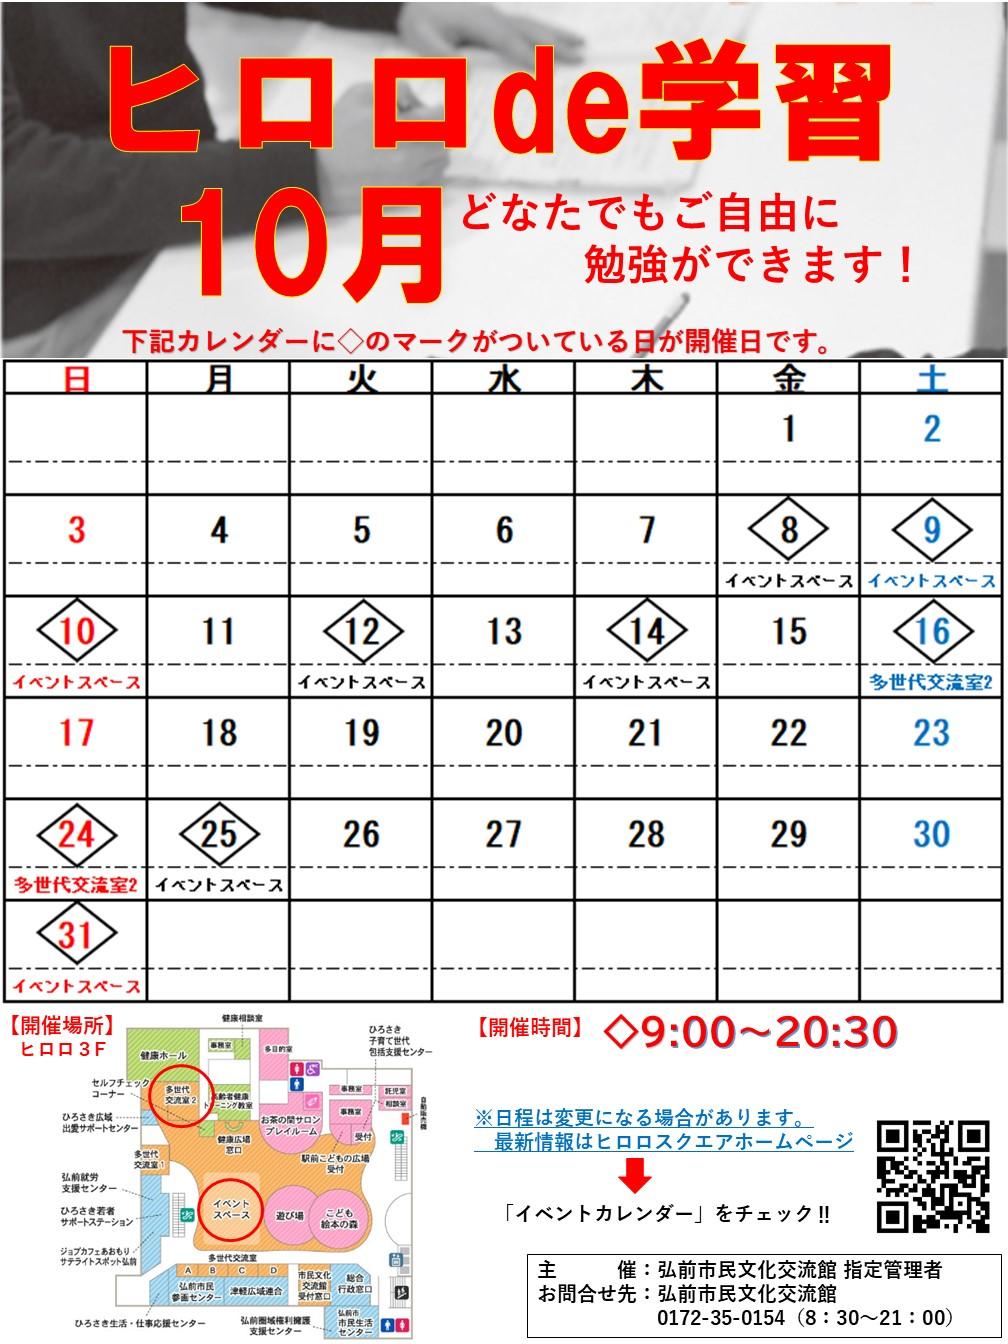 「ヒロロde学習」10月分日程